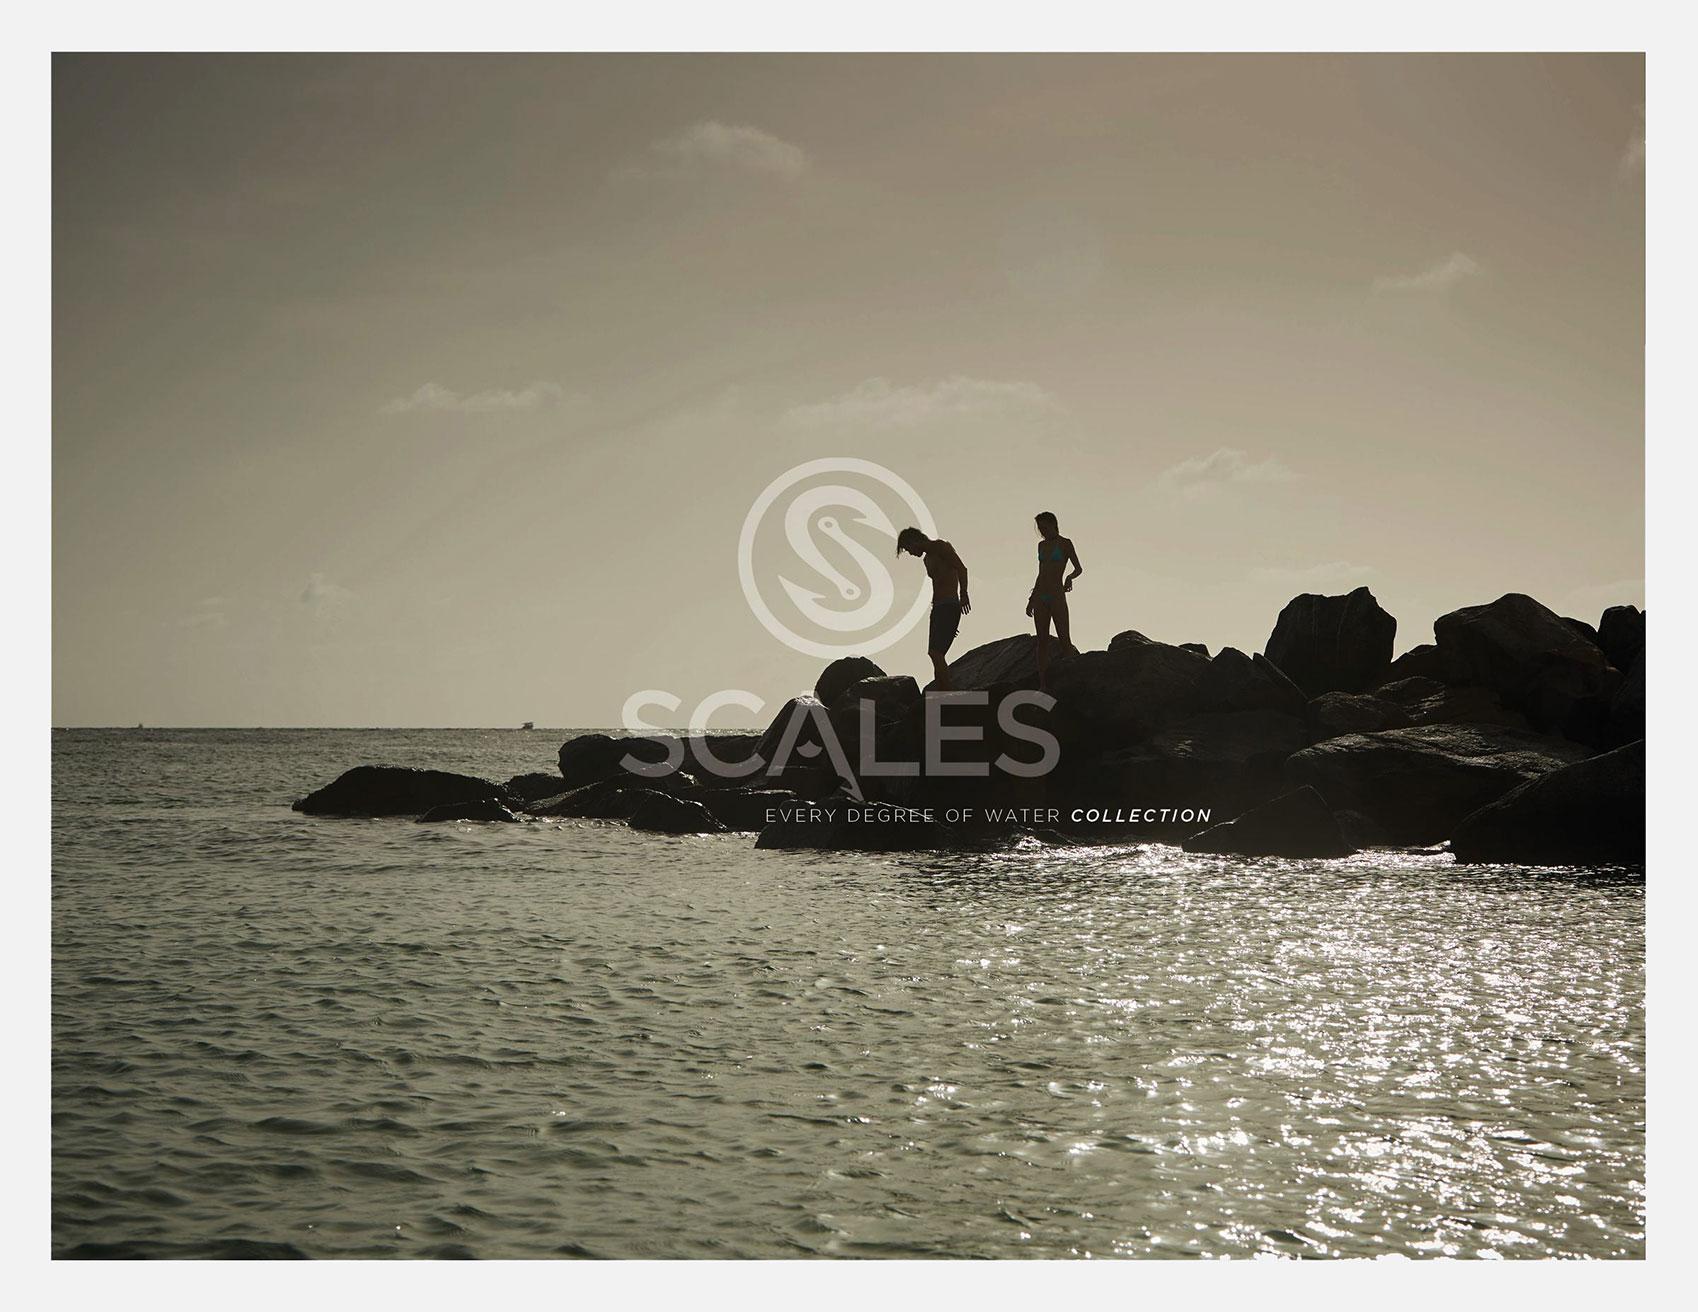 scales-catalog-1